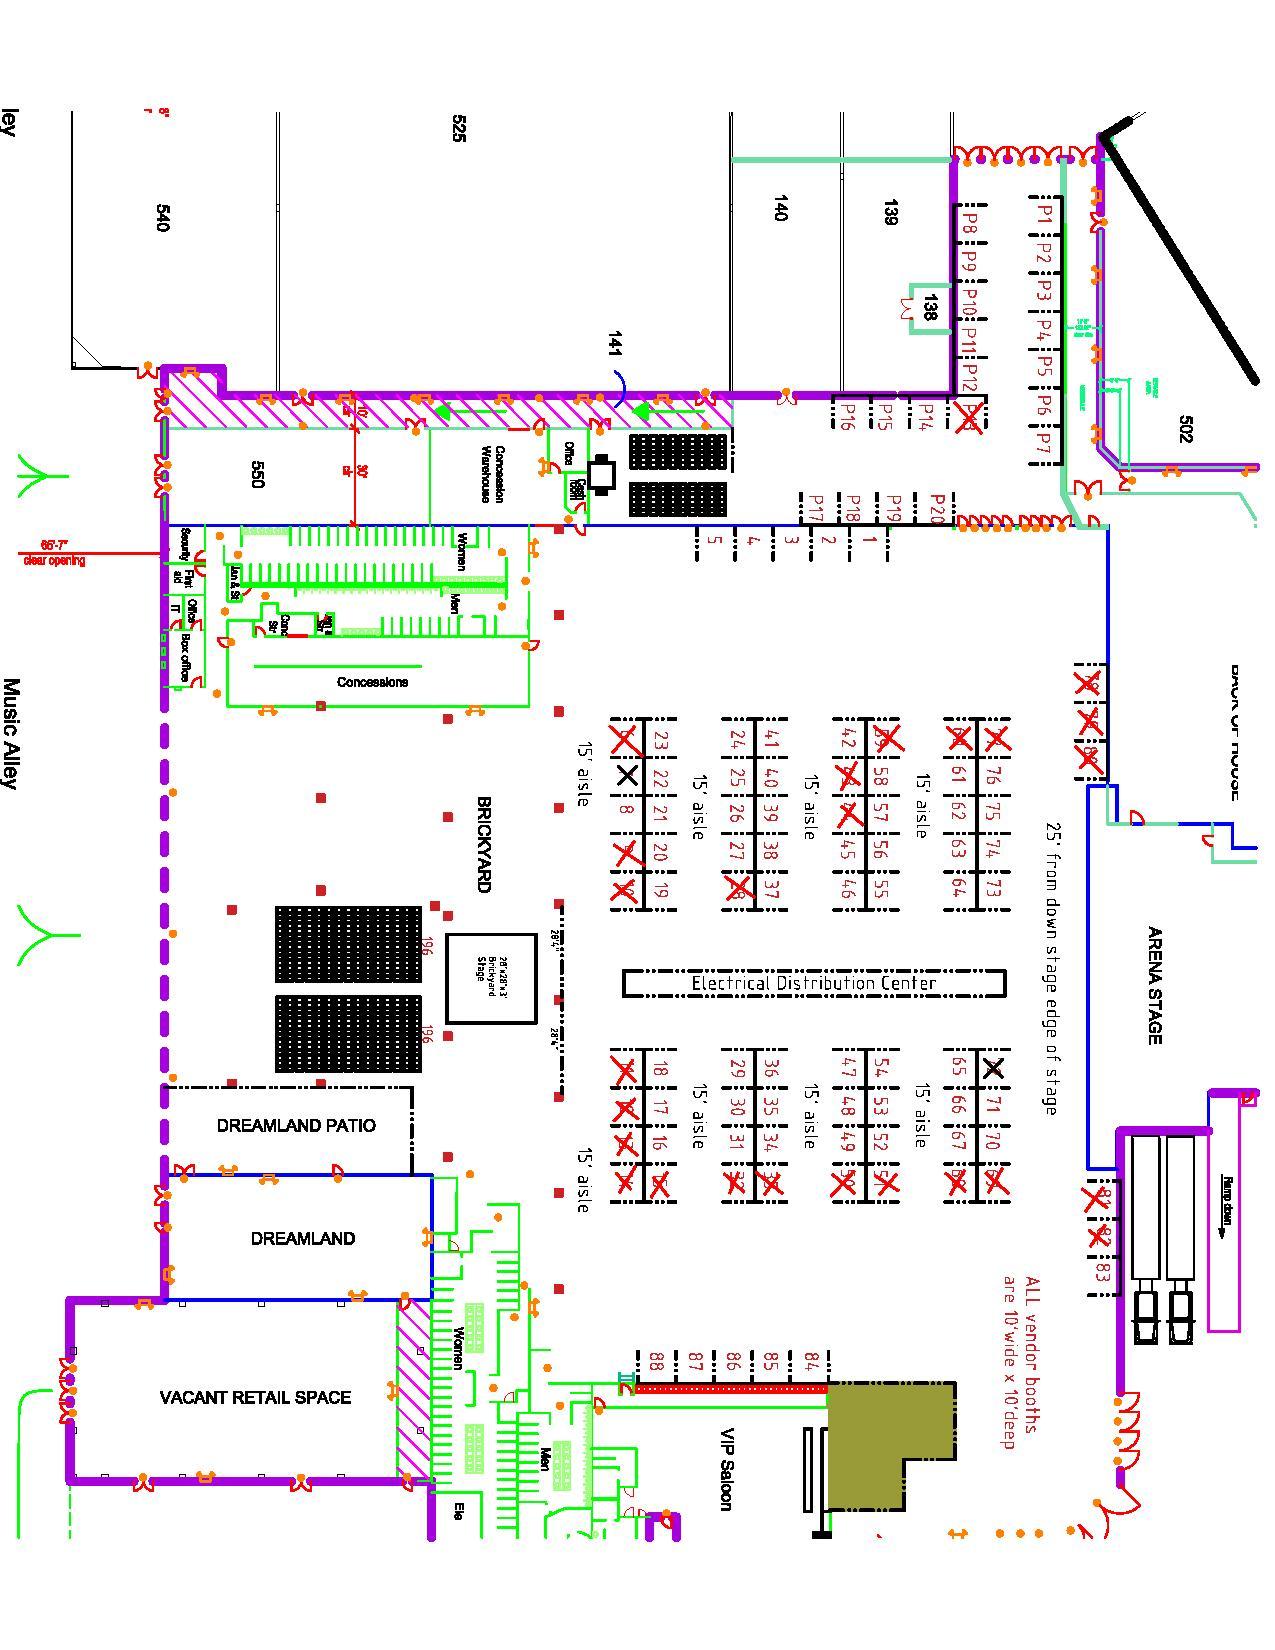 Home & Garden Show – Tallahassee Builders Assocation